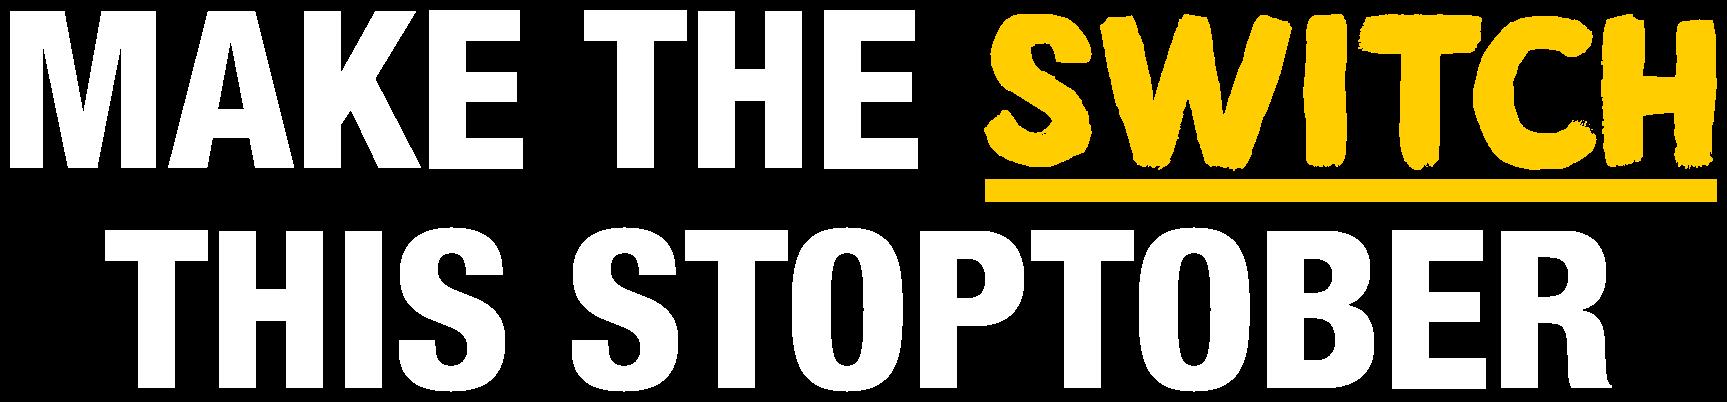 Make the switch this stoptober